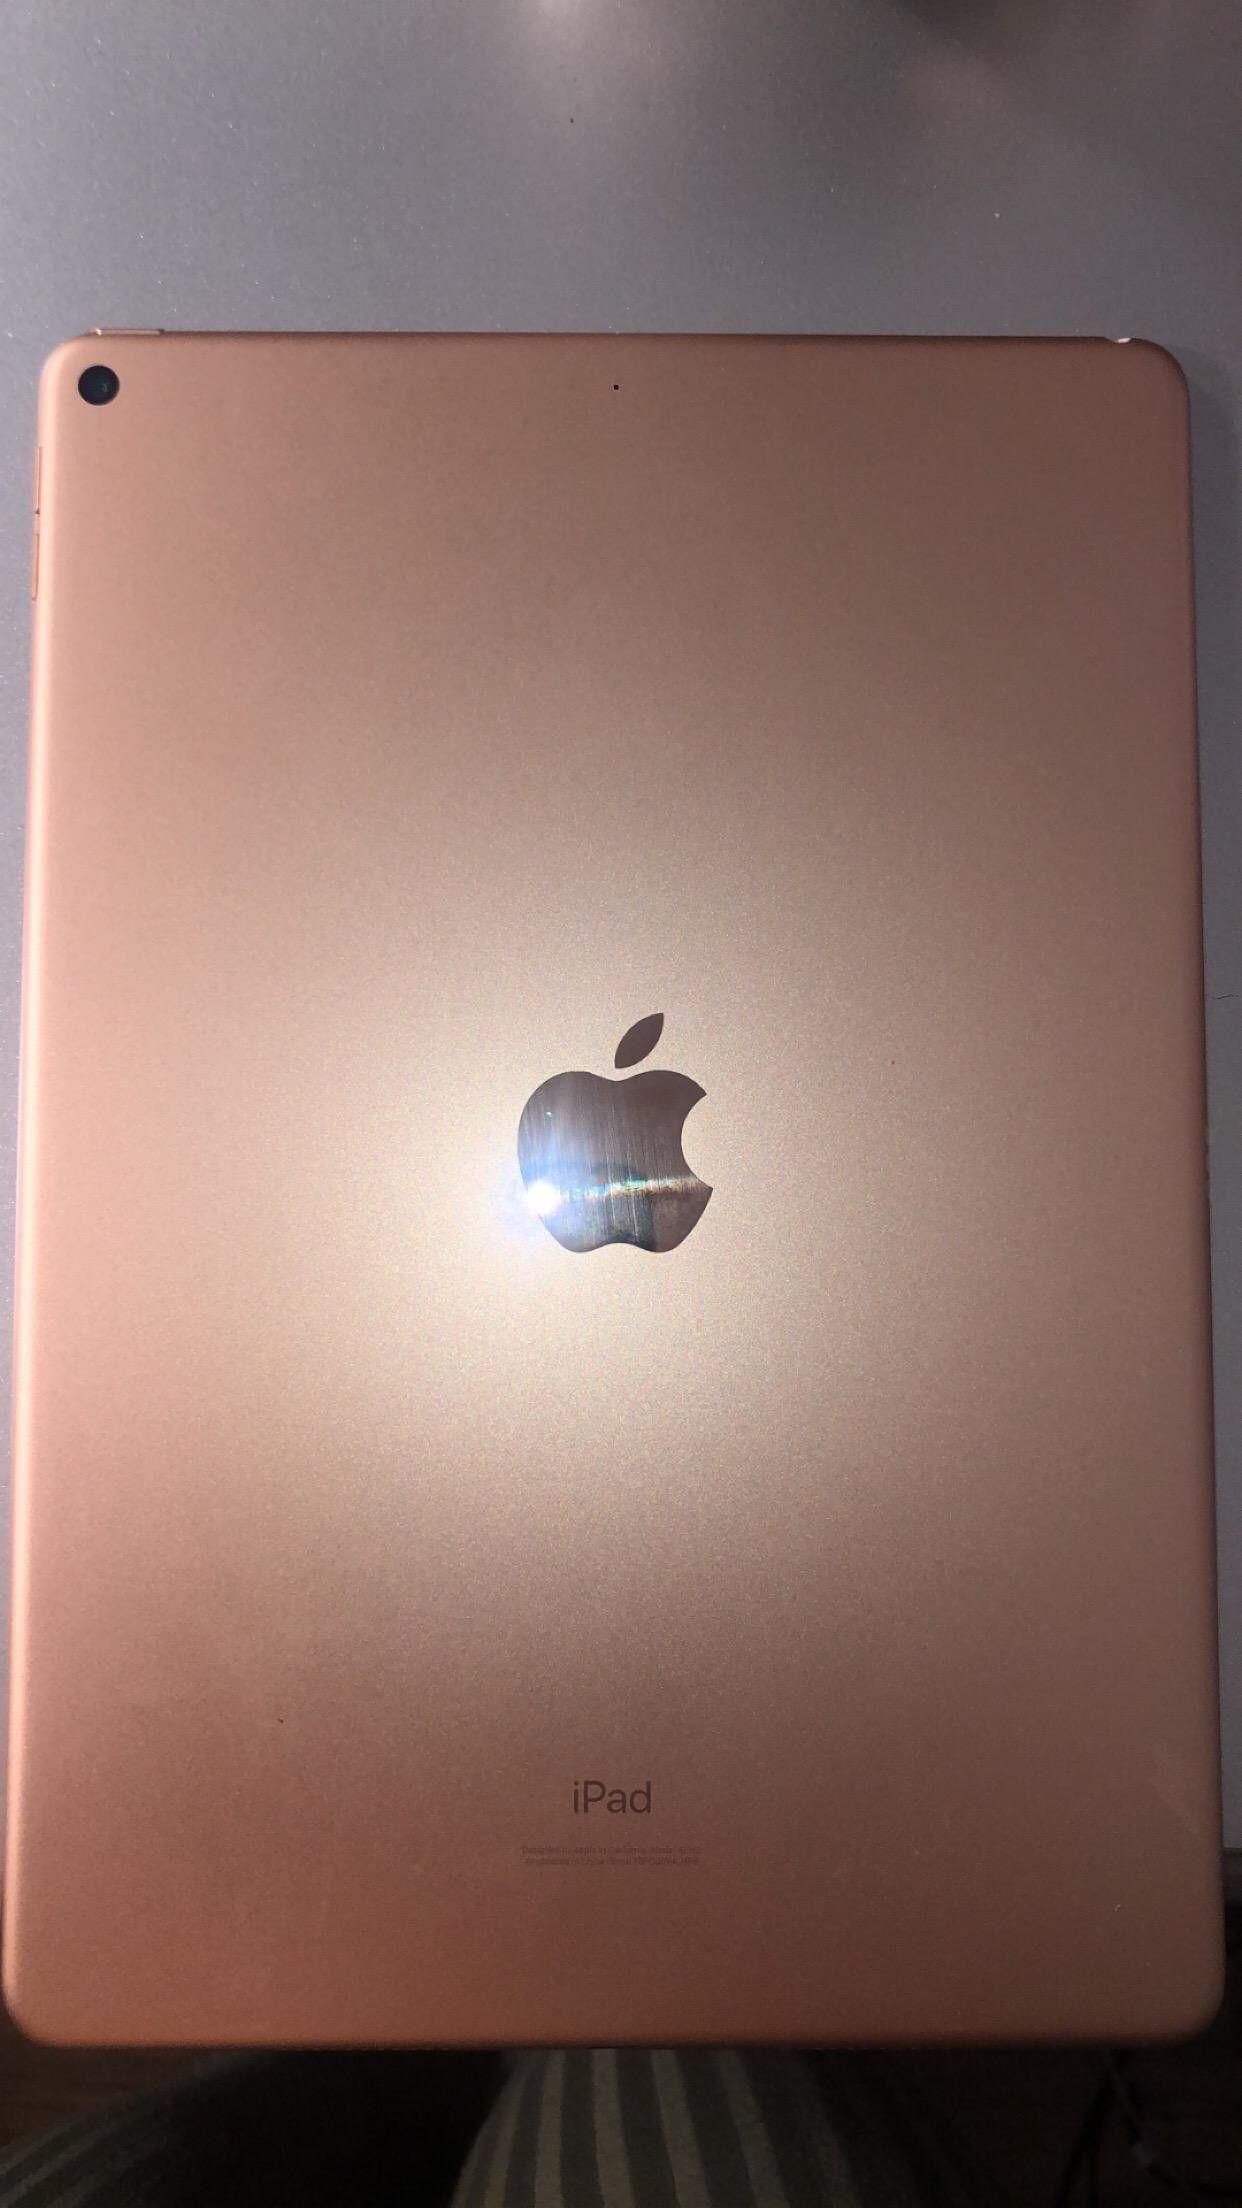 iPad 7th generation 32 GB 10.2 inch screen $320